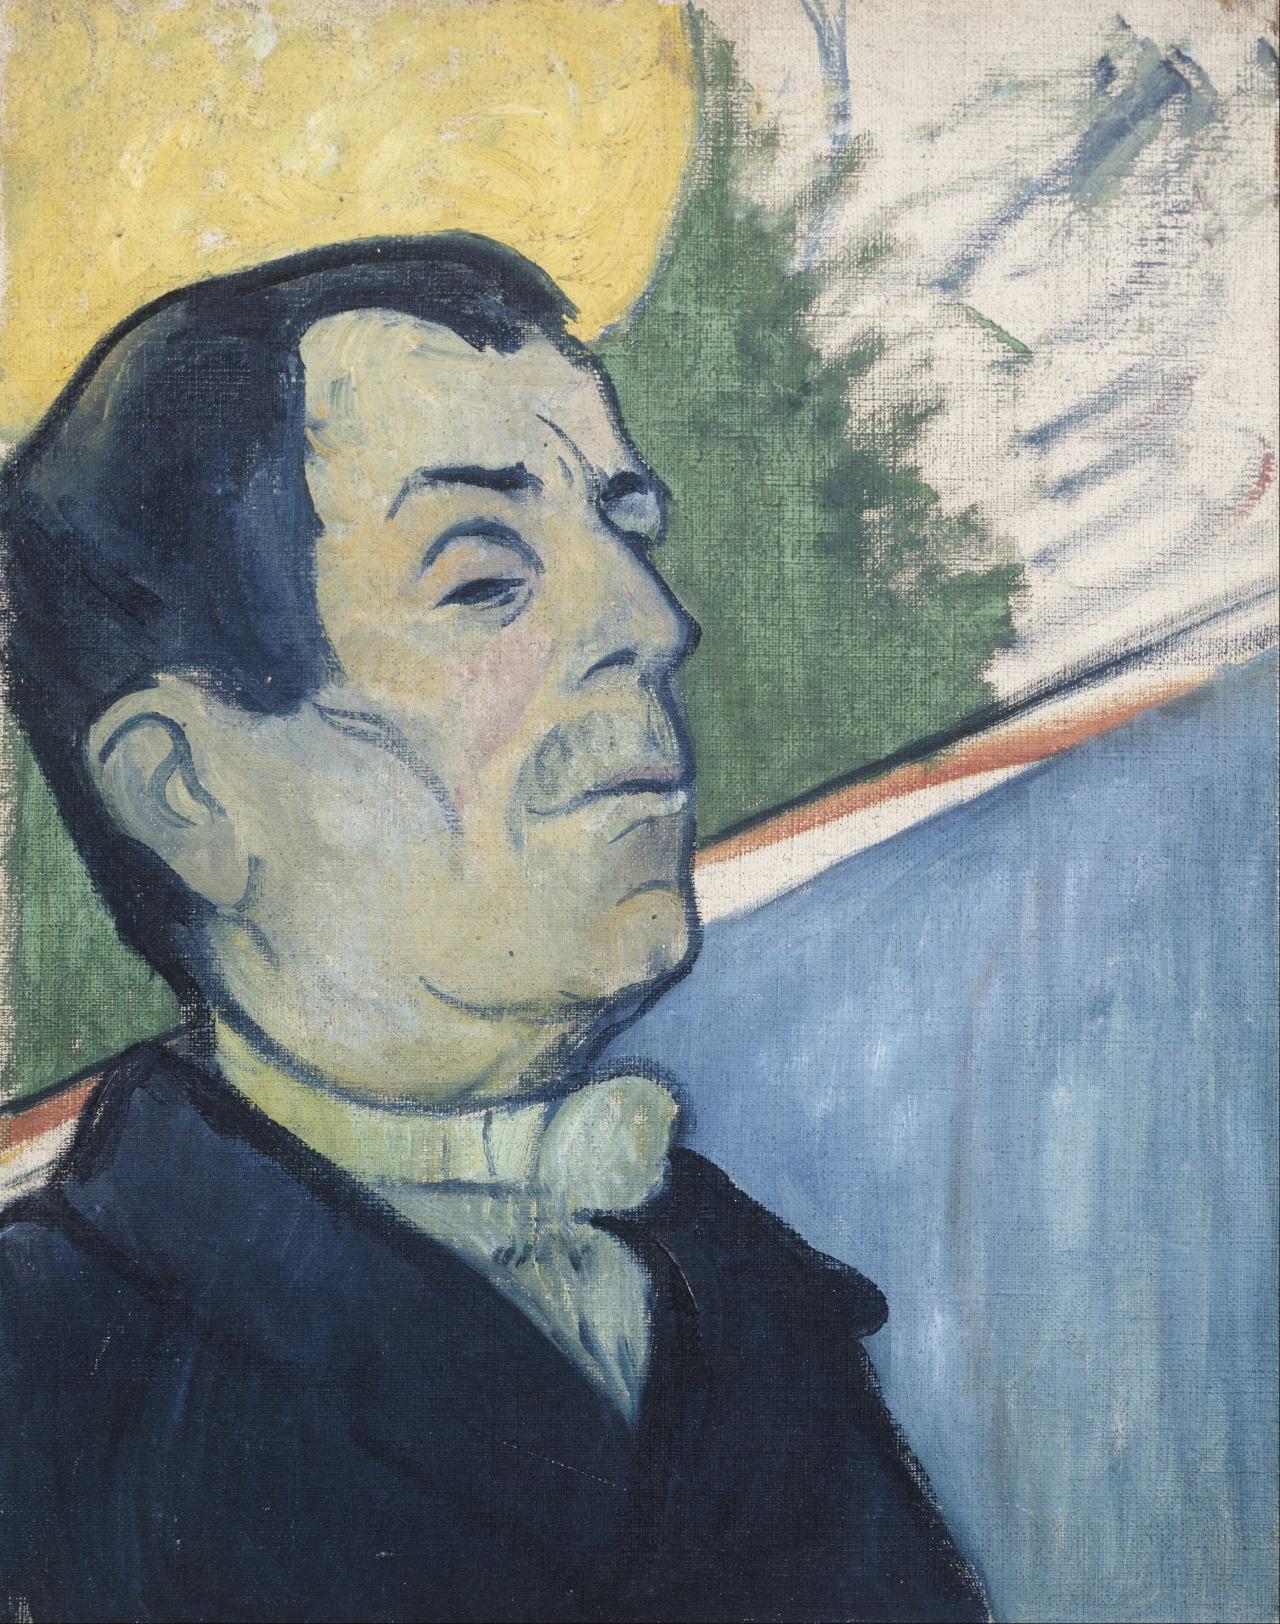 herzogtum-sachsen-weissenfels:  Paul Gauguin (French, 1848-1903), Portrait of a Man Wearing a Lavalliere, 1888. Oil on canvas, 40.5 x 32 cm.